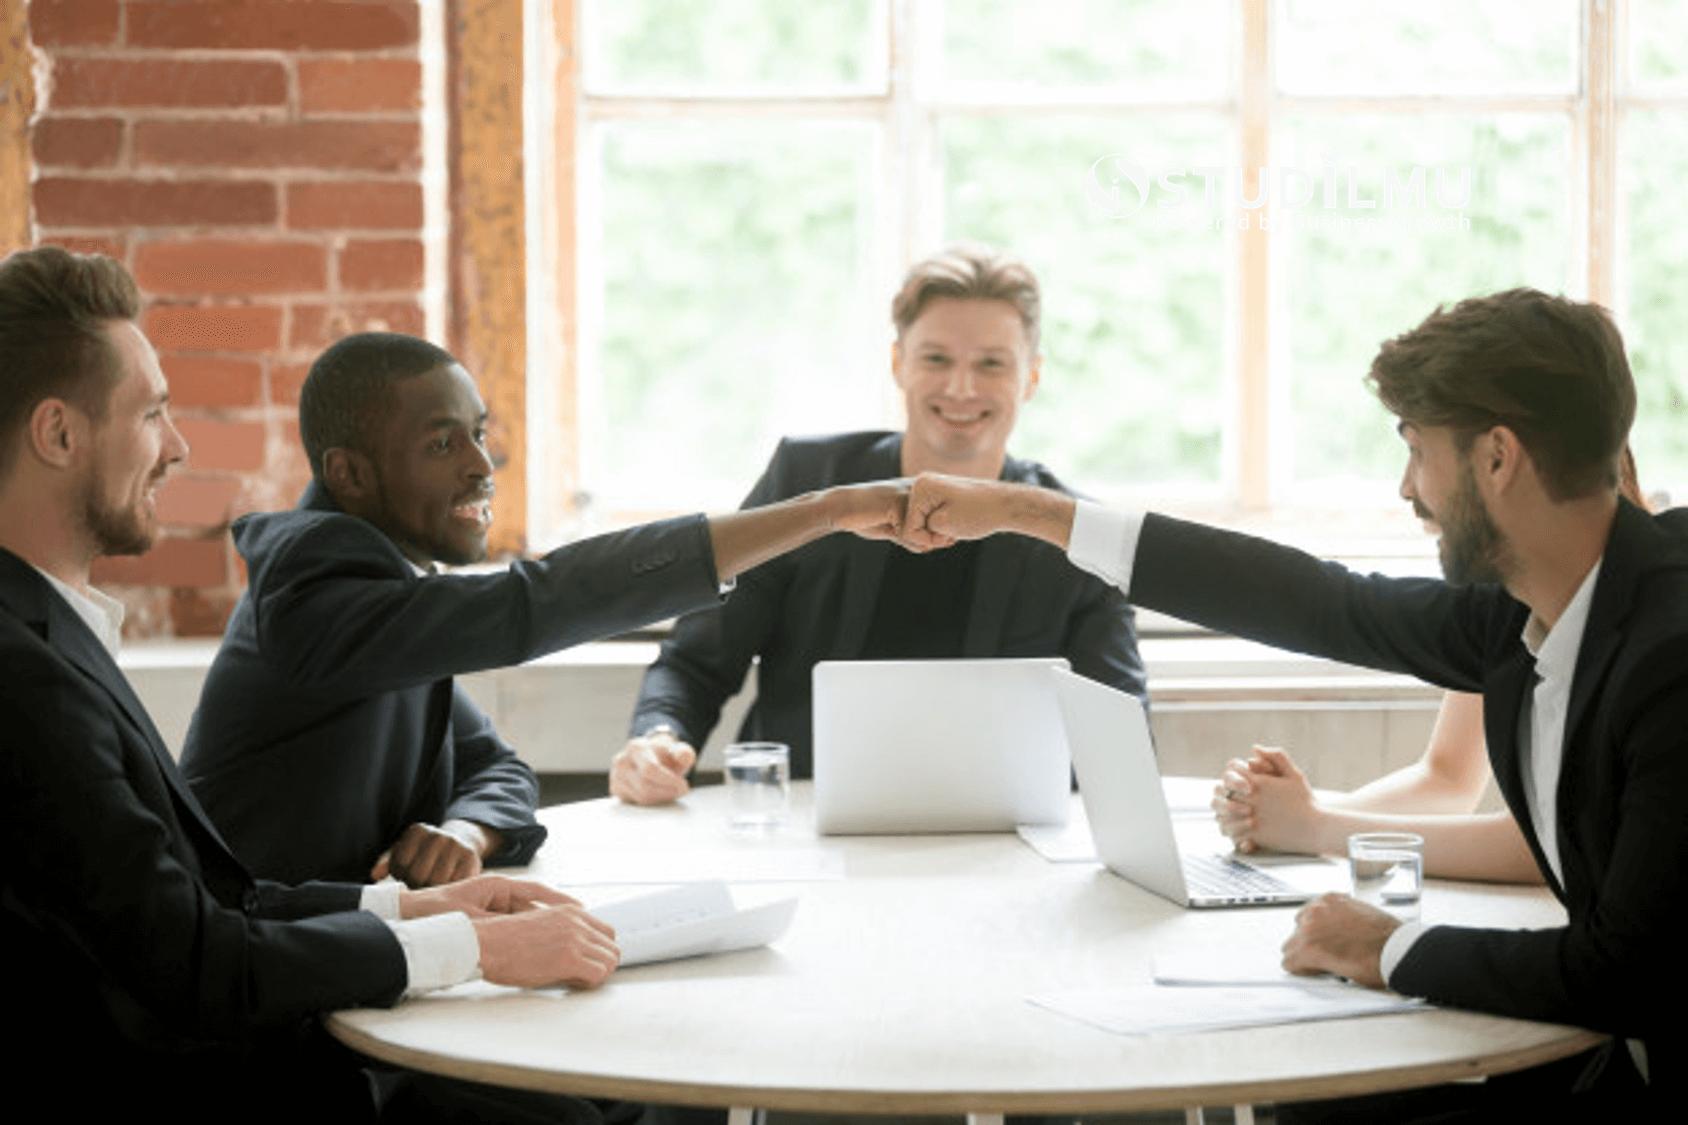 STUDILMU Career Advice - Mengenal Gaya Kepemimpinan dalam Organisasi dan 5 Keutamaannya